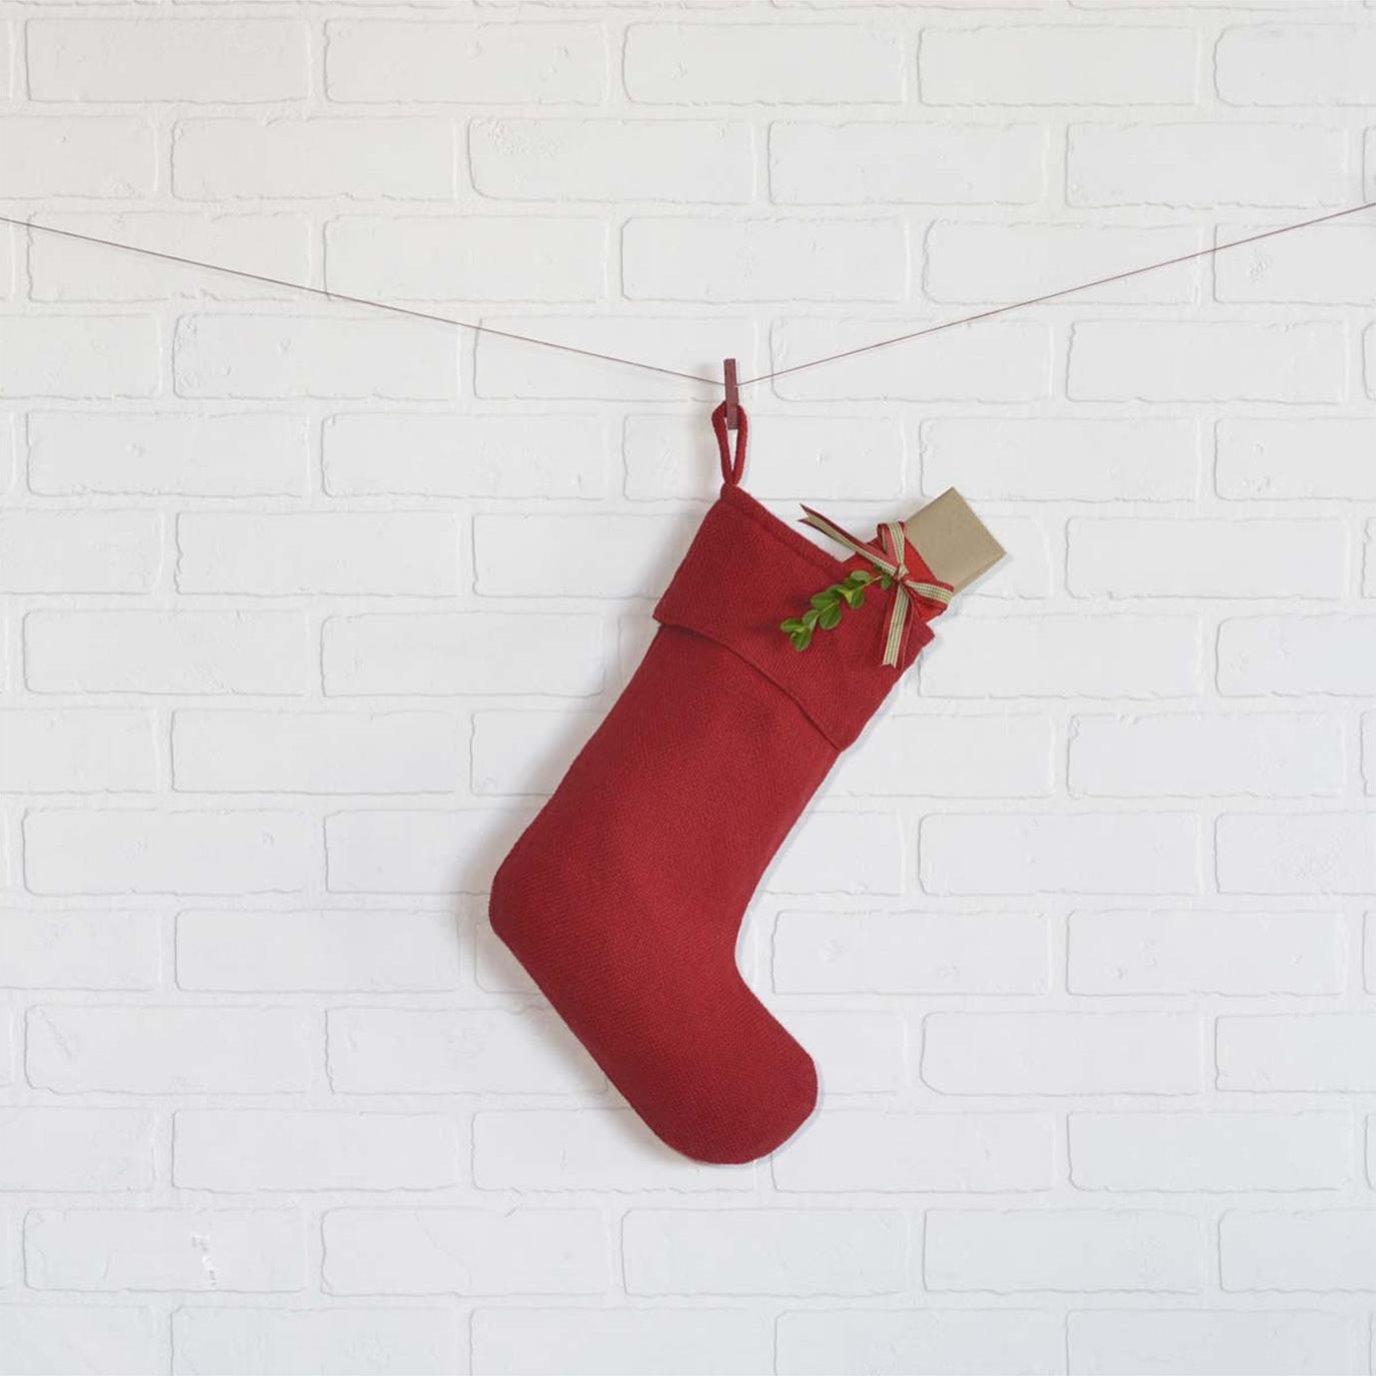 Festive Red Burlap Stocking 11x15